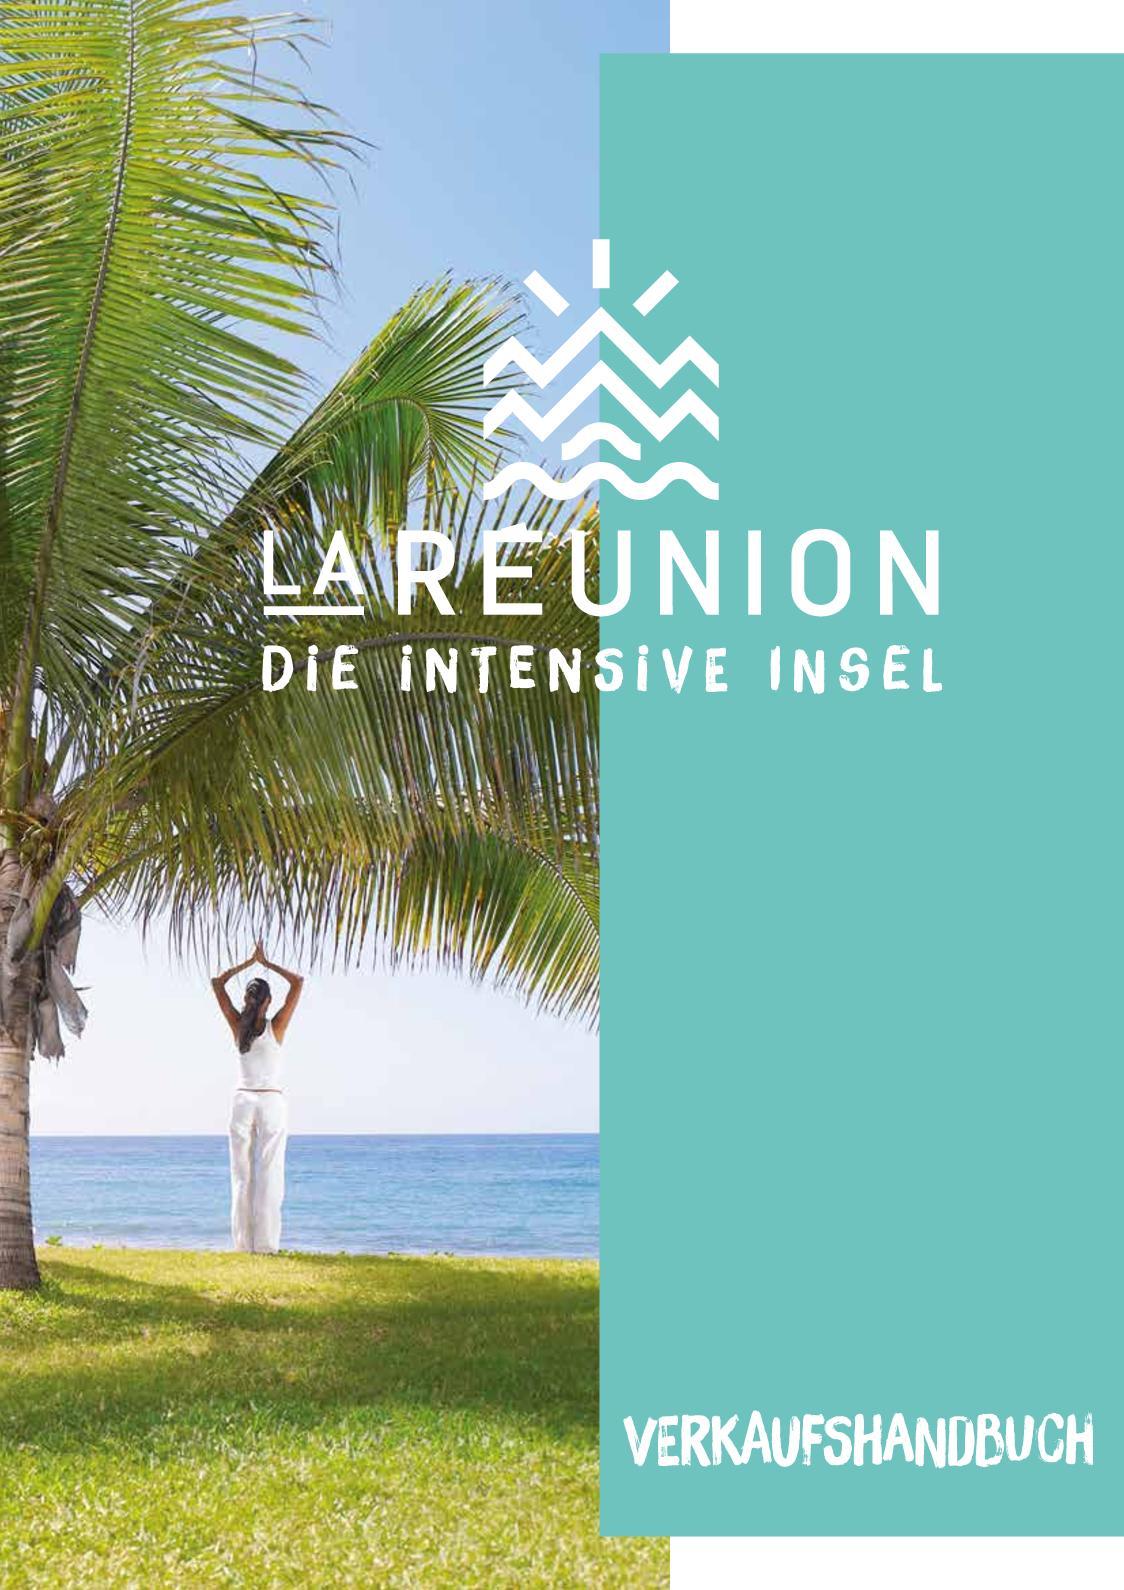 Calaméo - Verkaufshandbuch La Réunion 2019-2020